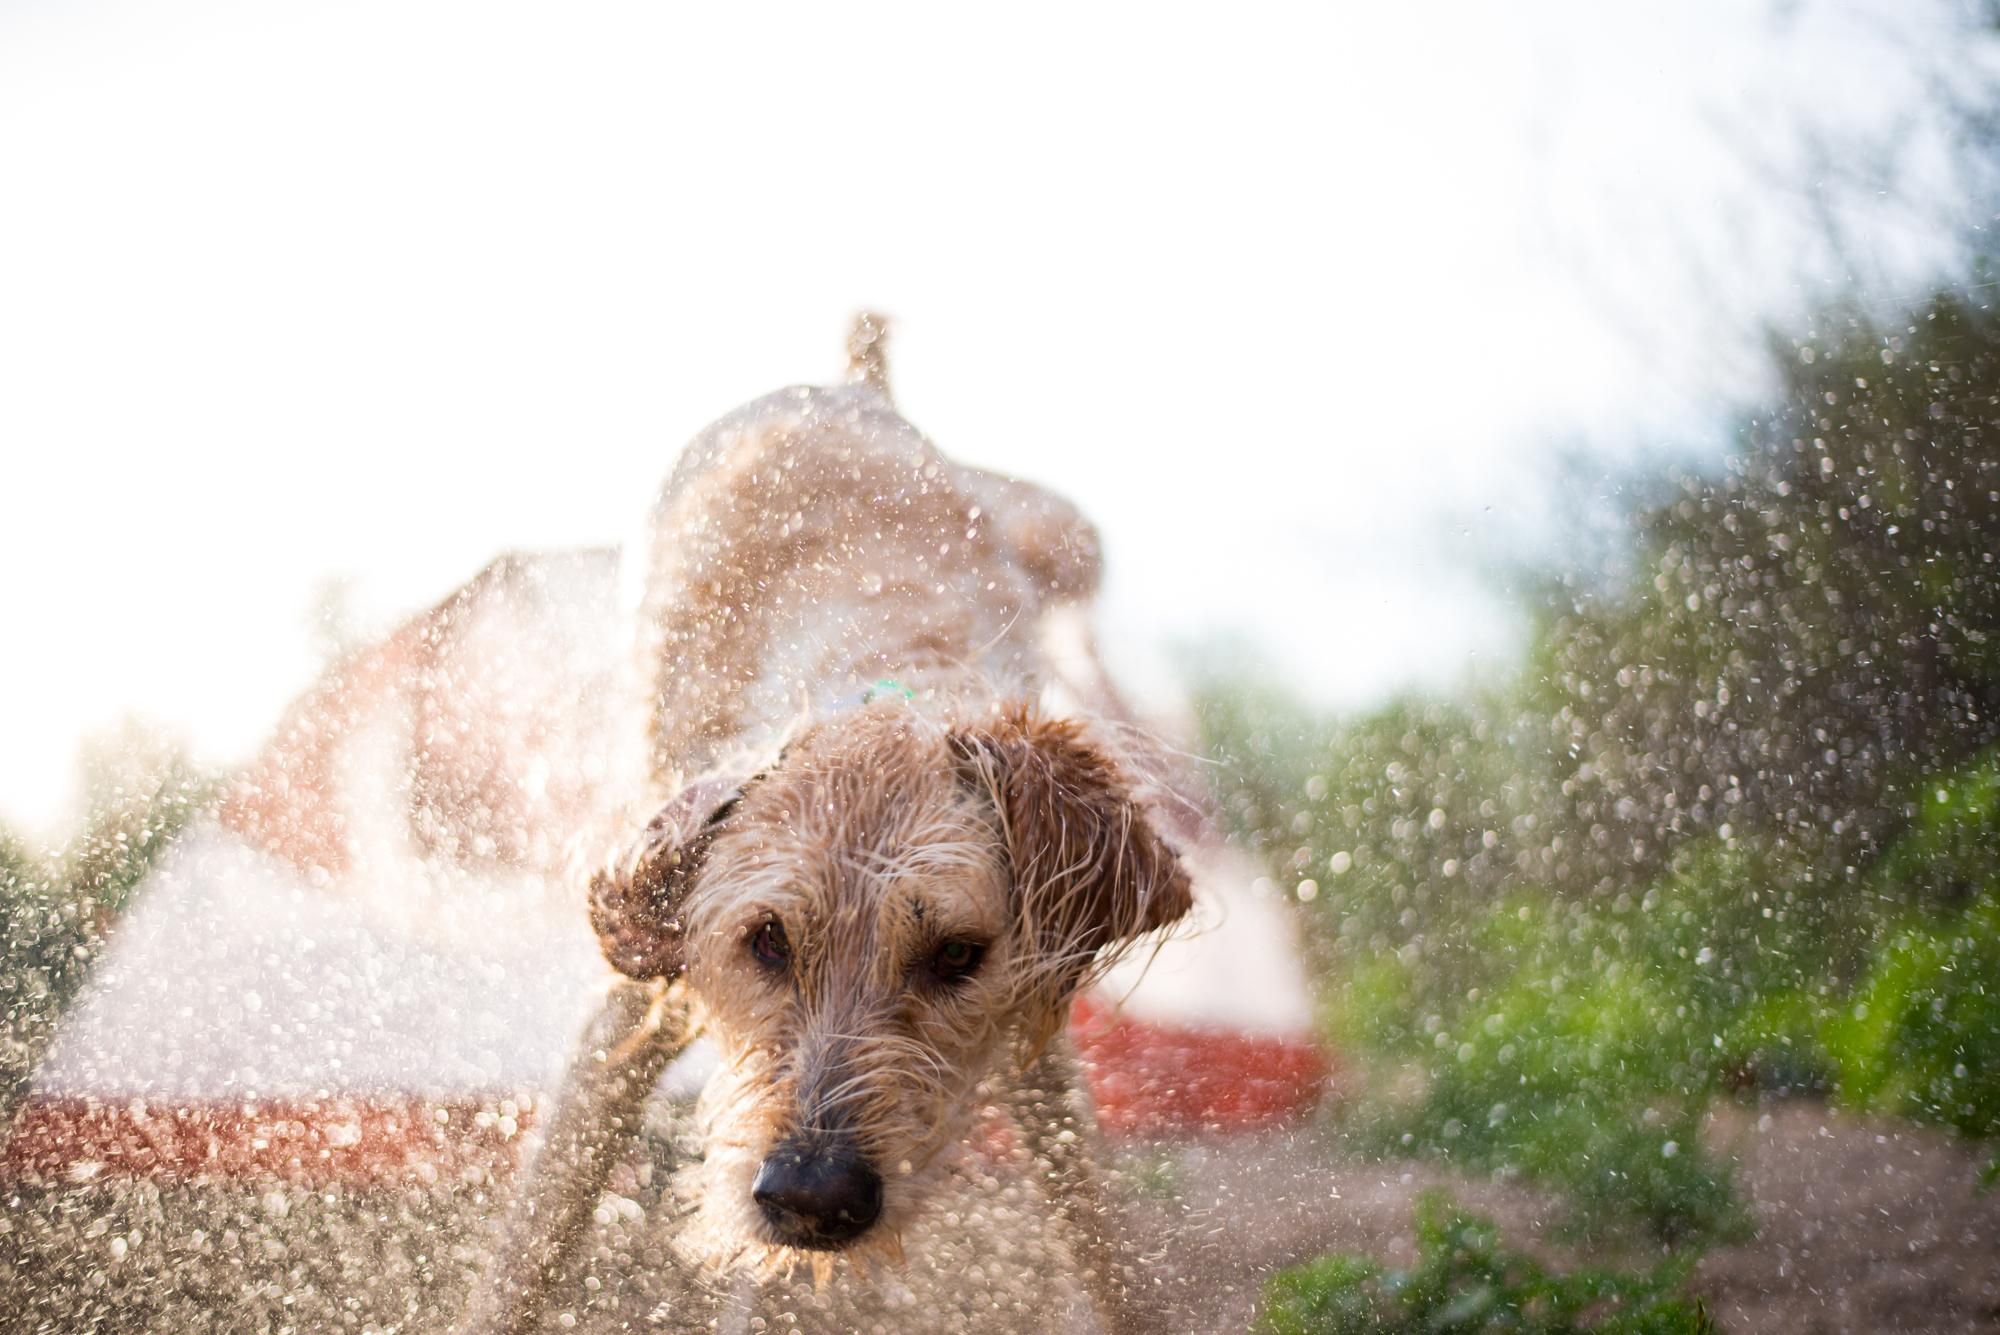 wet dog photo by weston carls.jpg